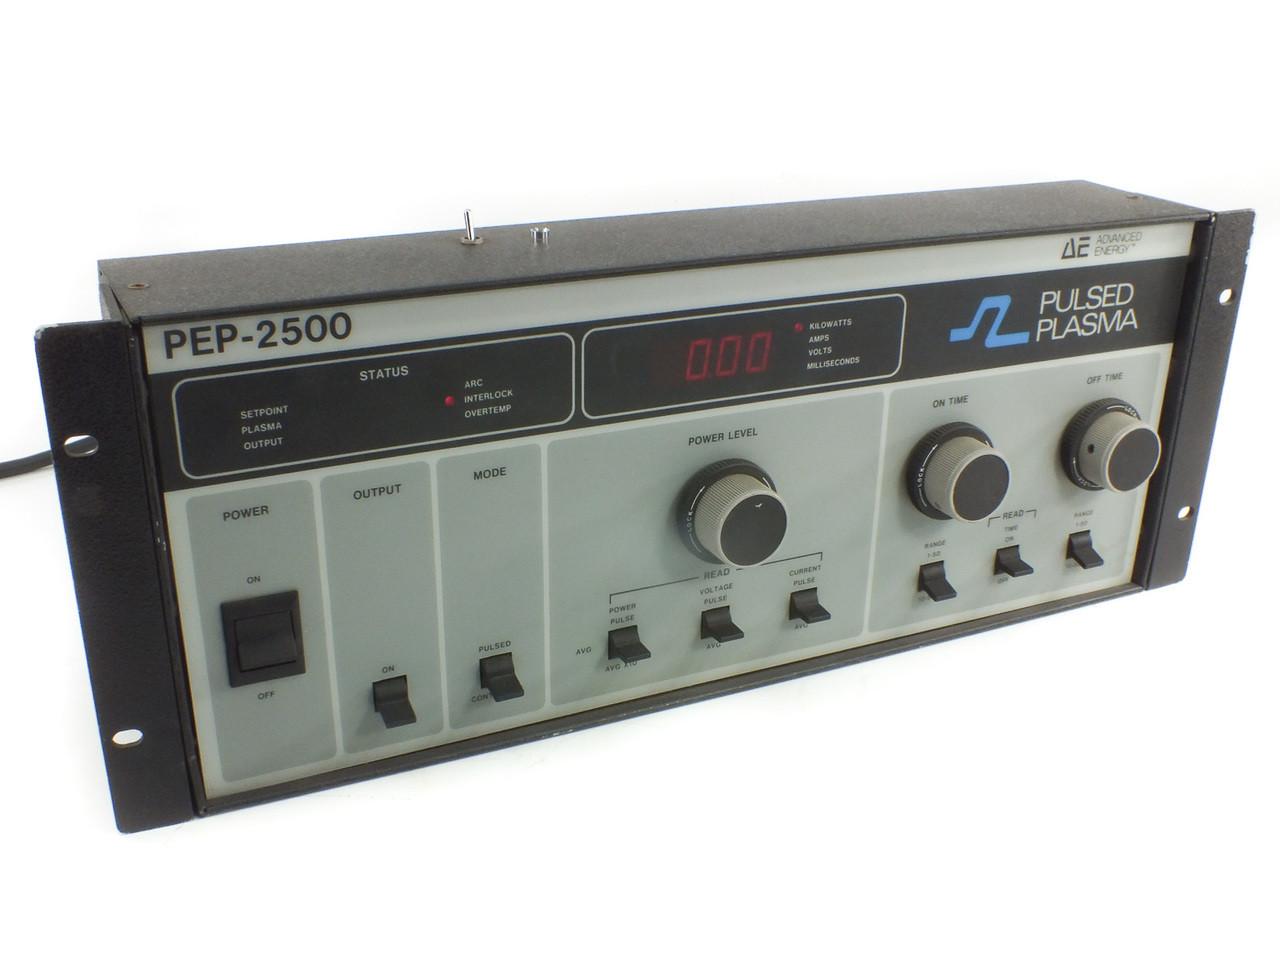 Advanced Energy AE PEP-2500 Pulsed Plasma Bipolar DC RF Power Supply  Generator